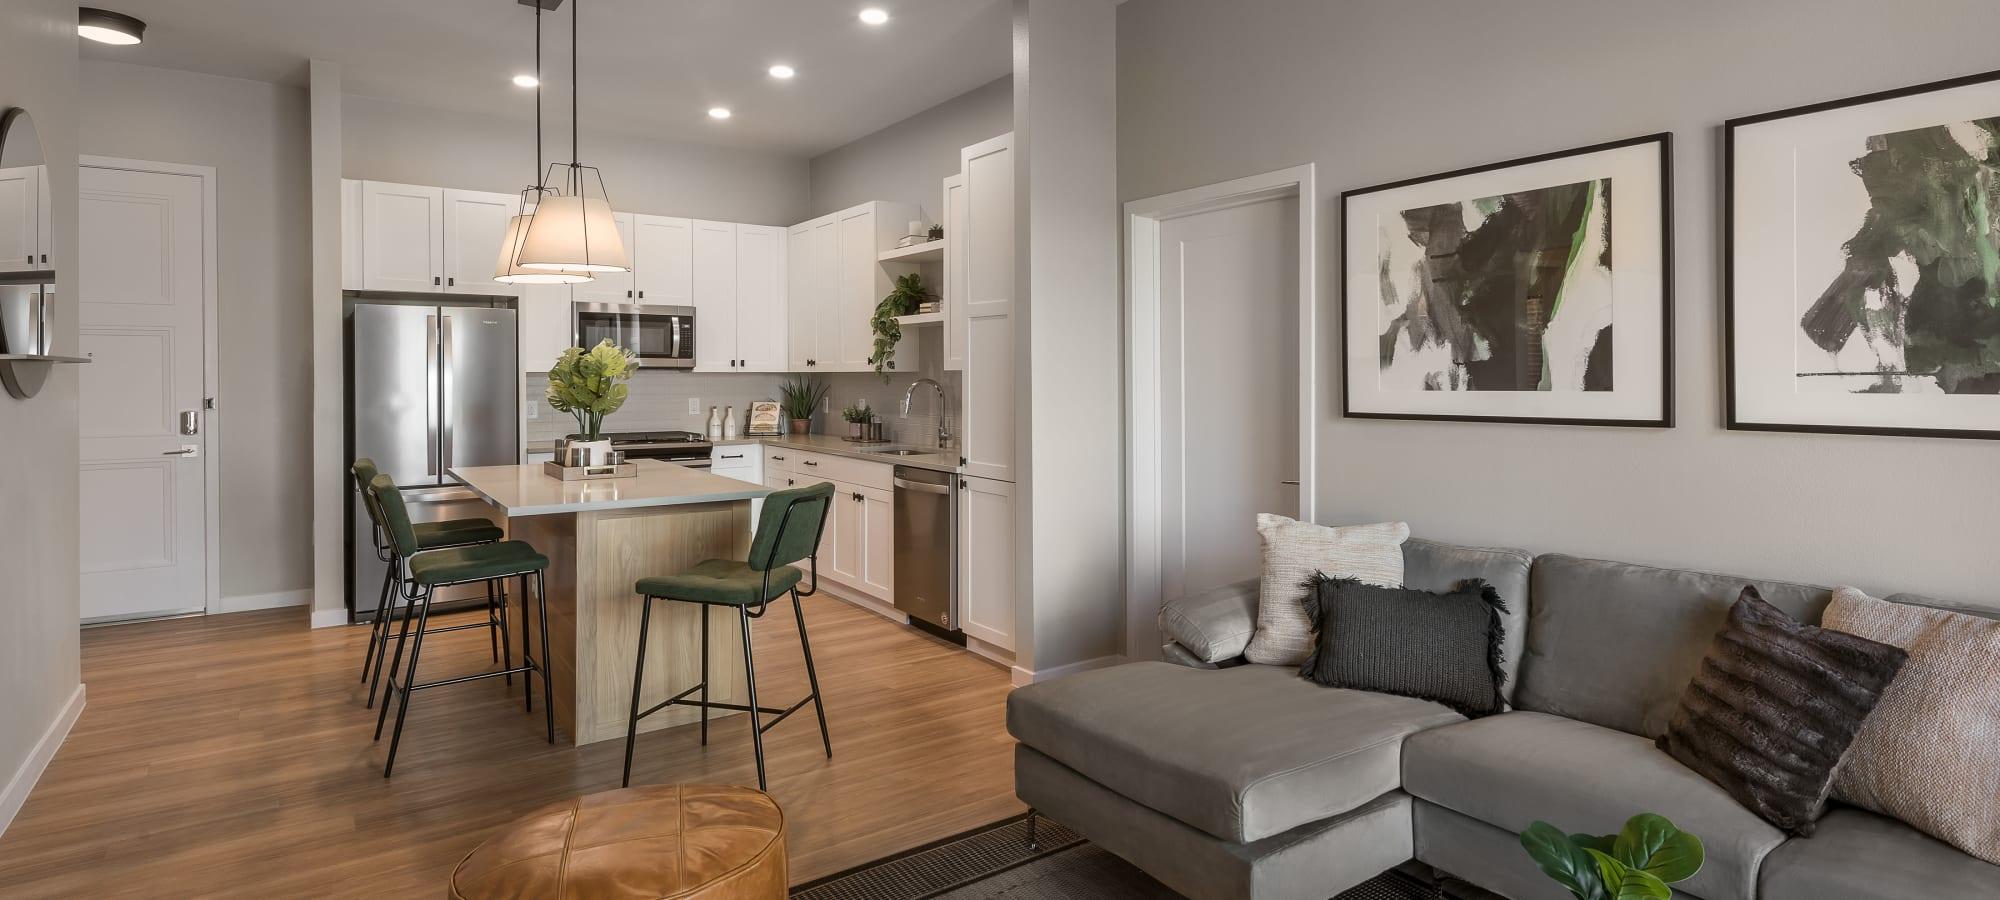 Modern interior and kitchen at Gramercy Scottsdale in Scottsdale, Arizona